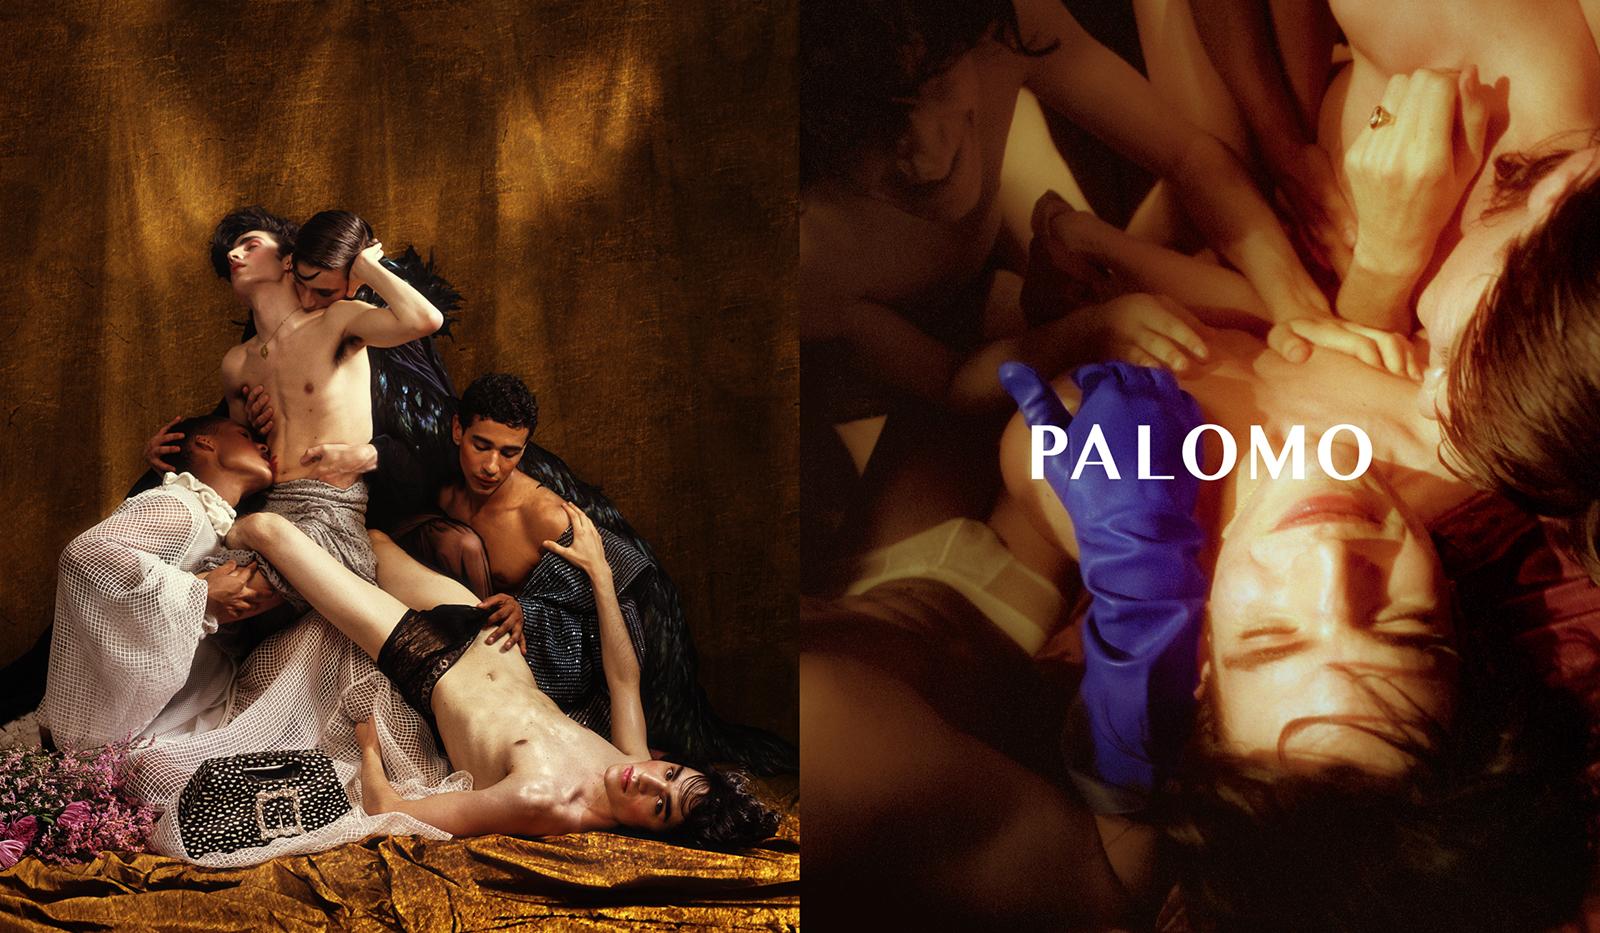 Palomo Spain<br> Fall 2019 Campaign